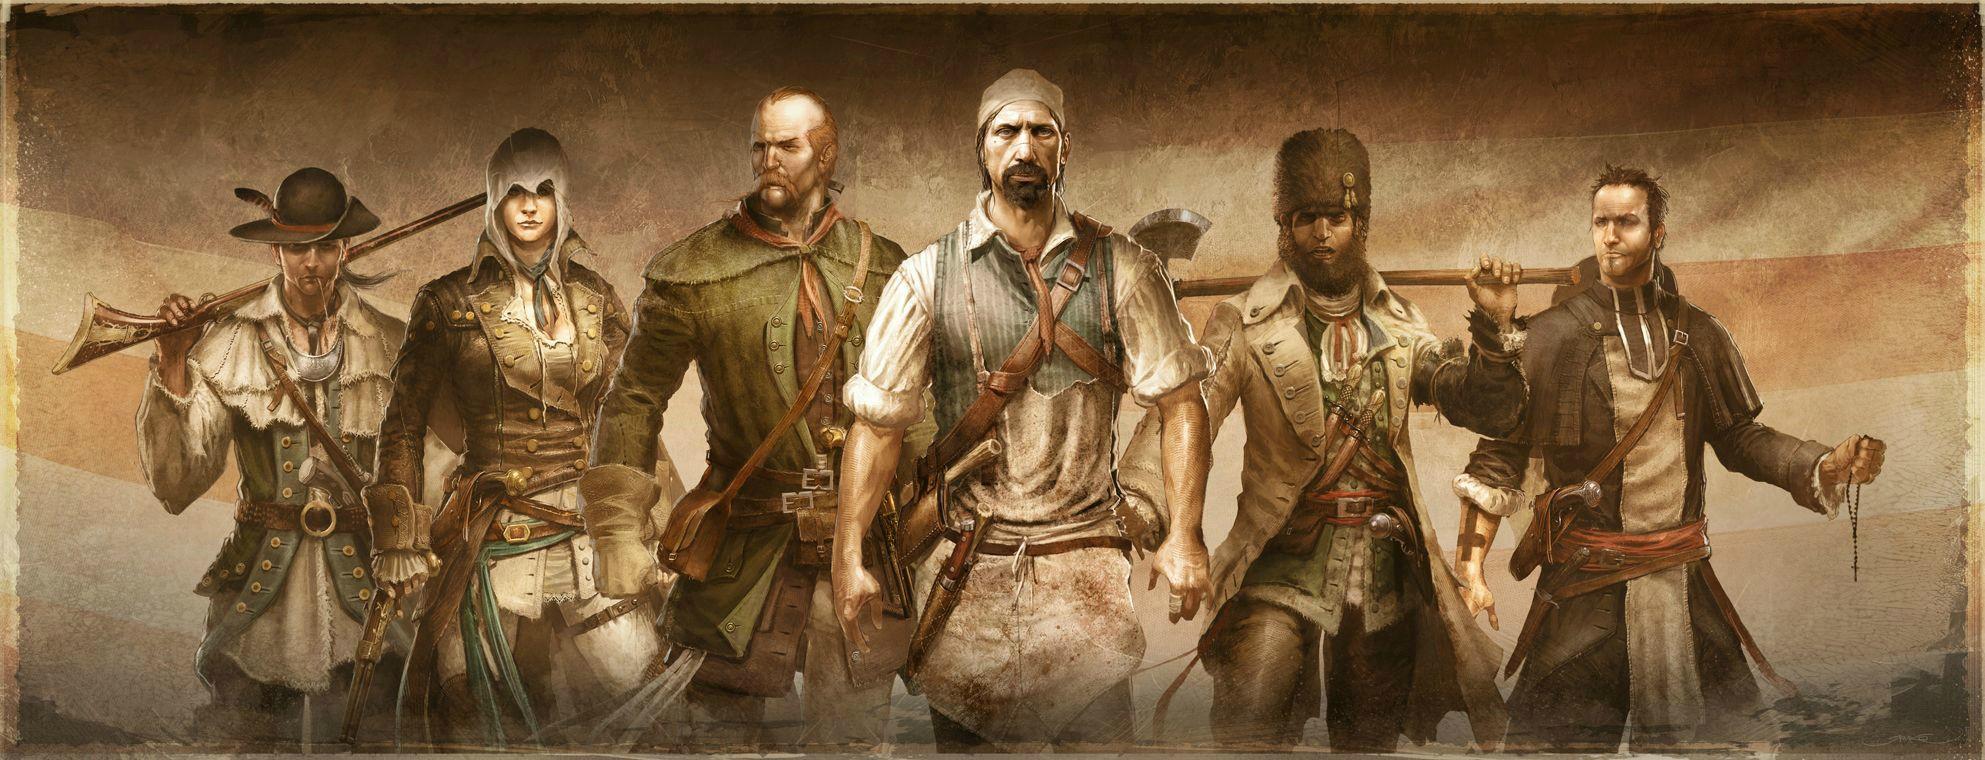 Assasssin's Creed III (Multiplayer) - Recenze 71192